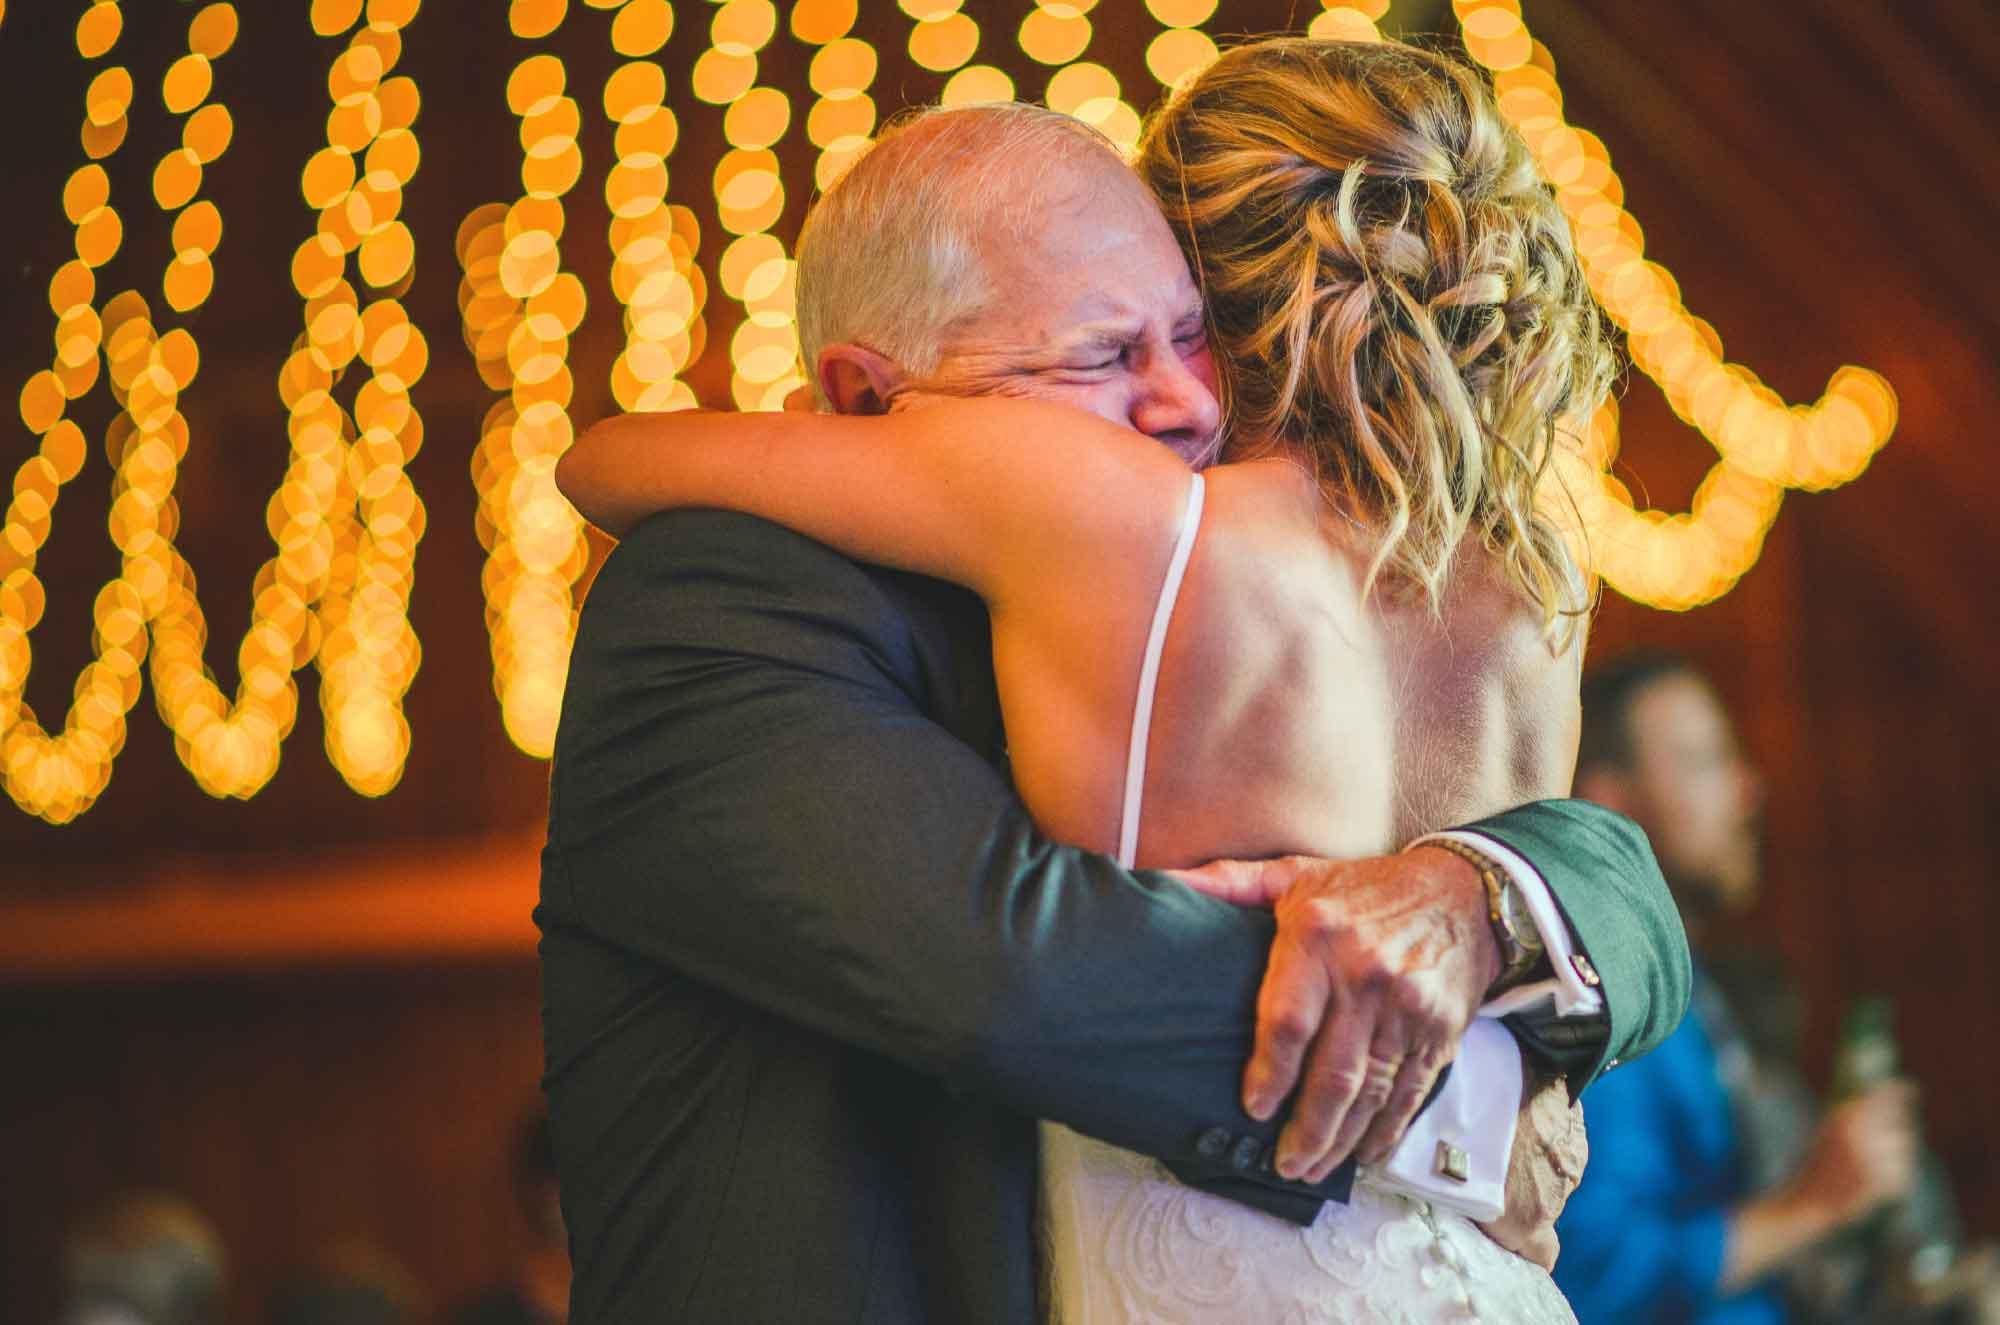 27-father-daughter-emotional-dance-wedding.jpg